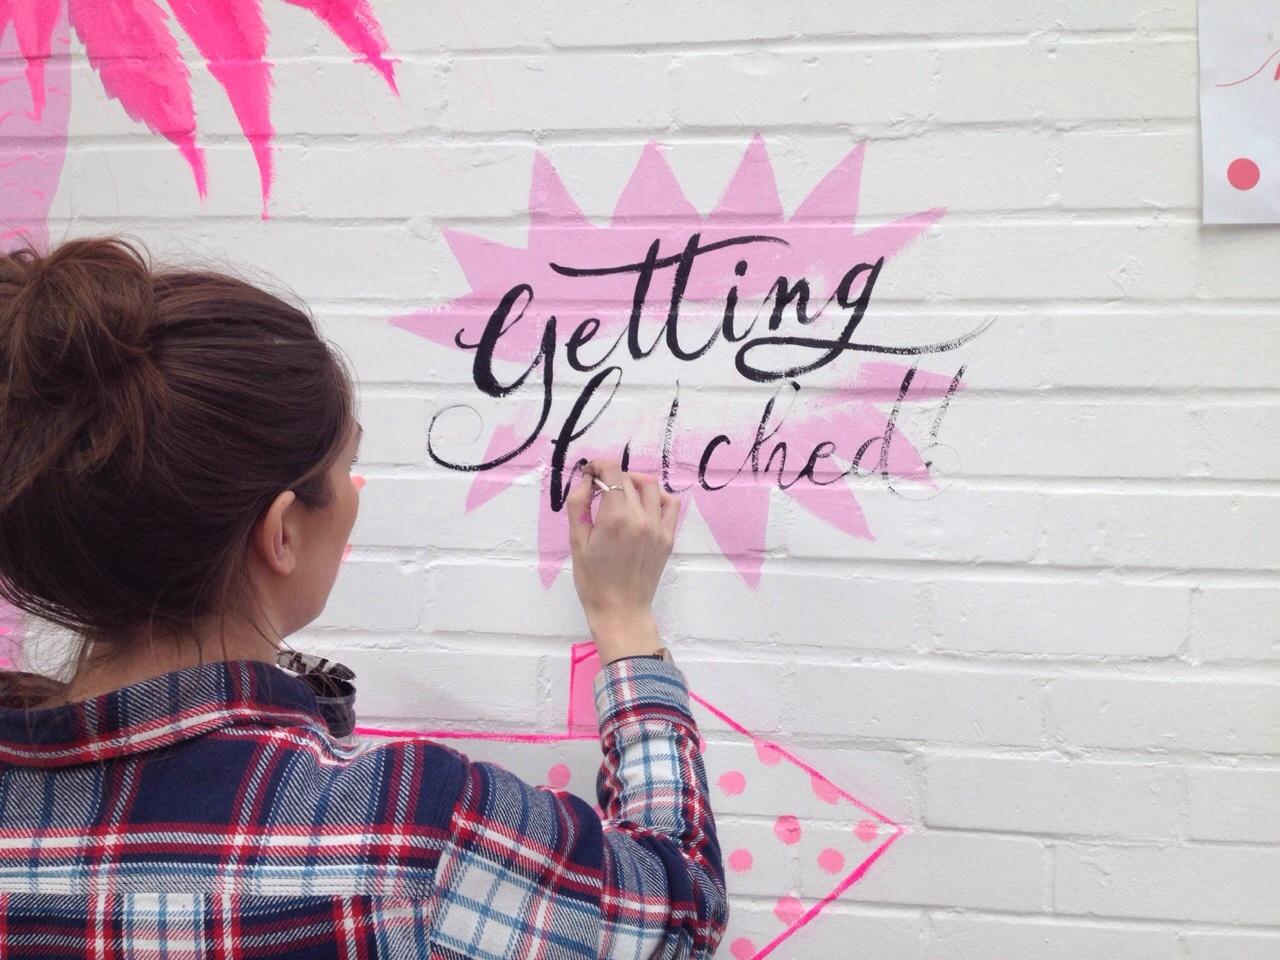 Lamplighter London Calligraphy Mural